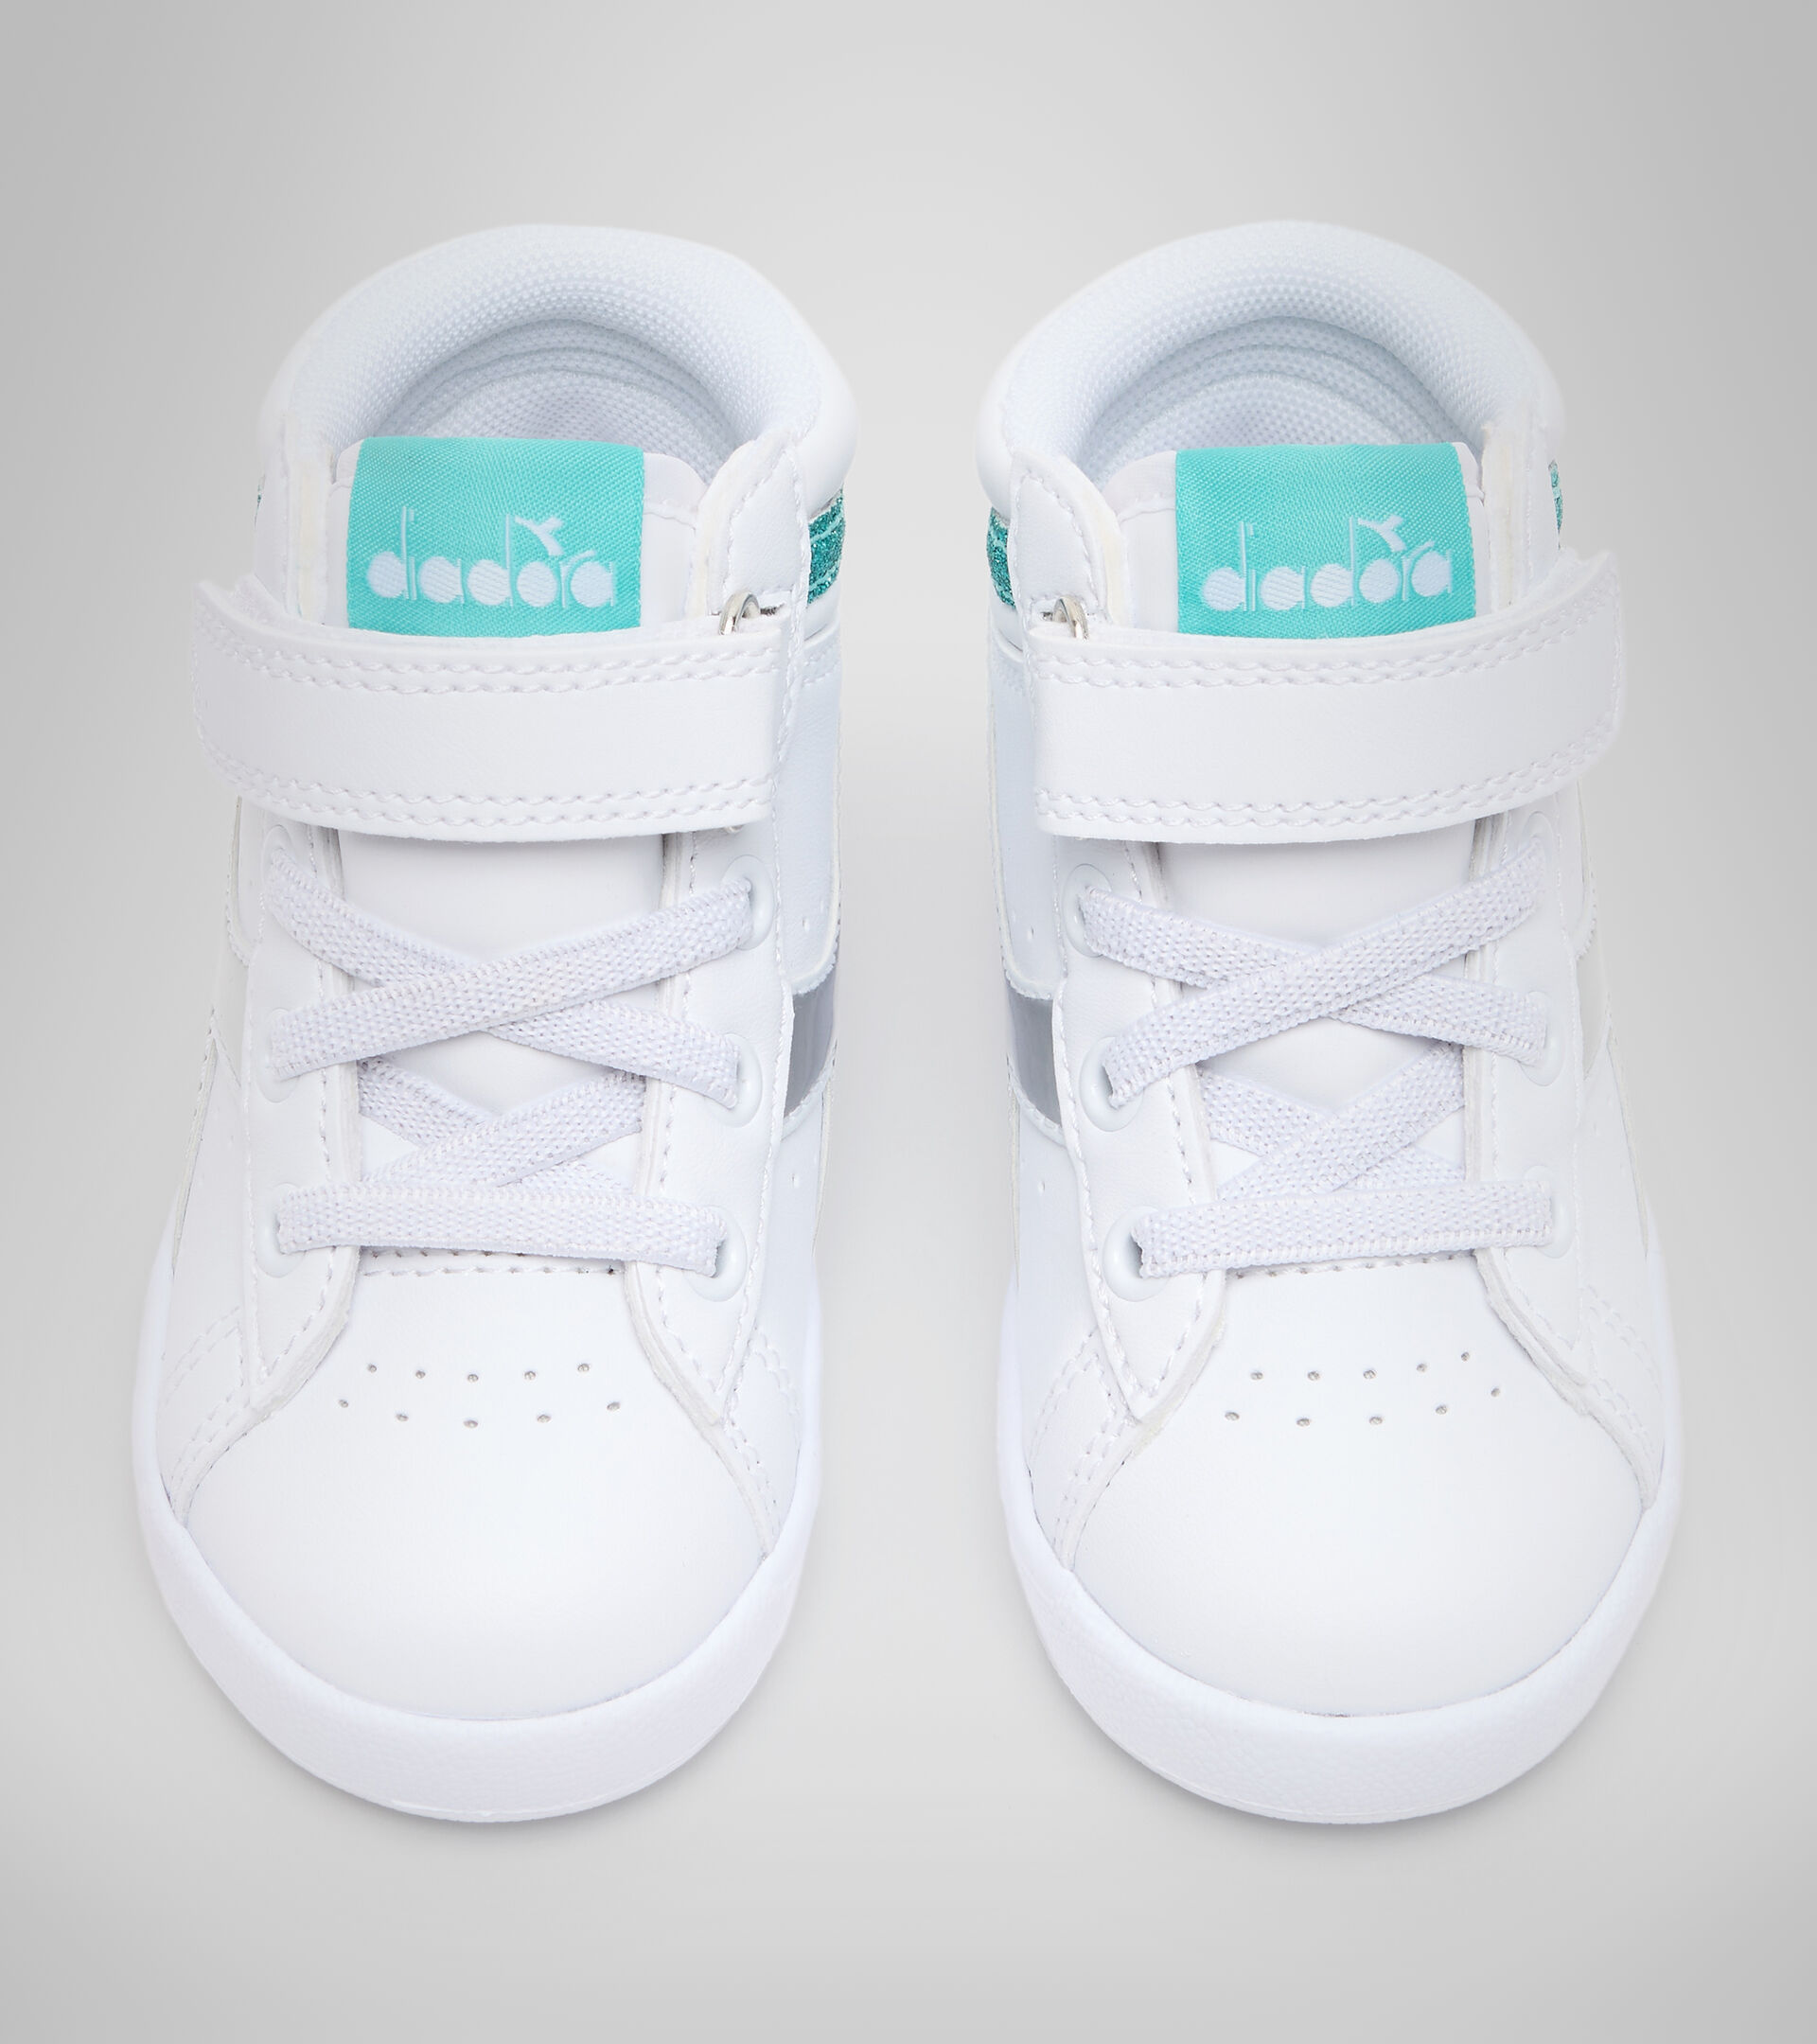 Chaussures de sport - Bambins 1-4 ans GAME P HIGH GIRL TD BLANC/BLEU TURQUOISE - Diadora